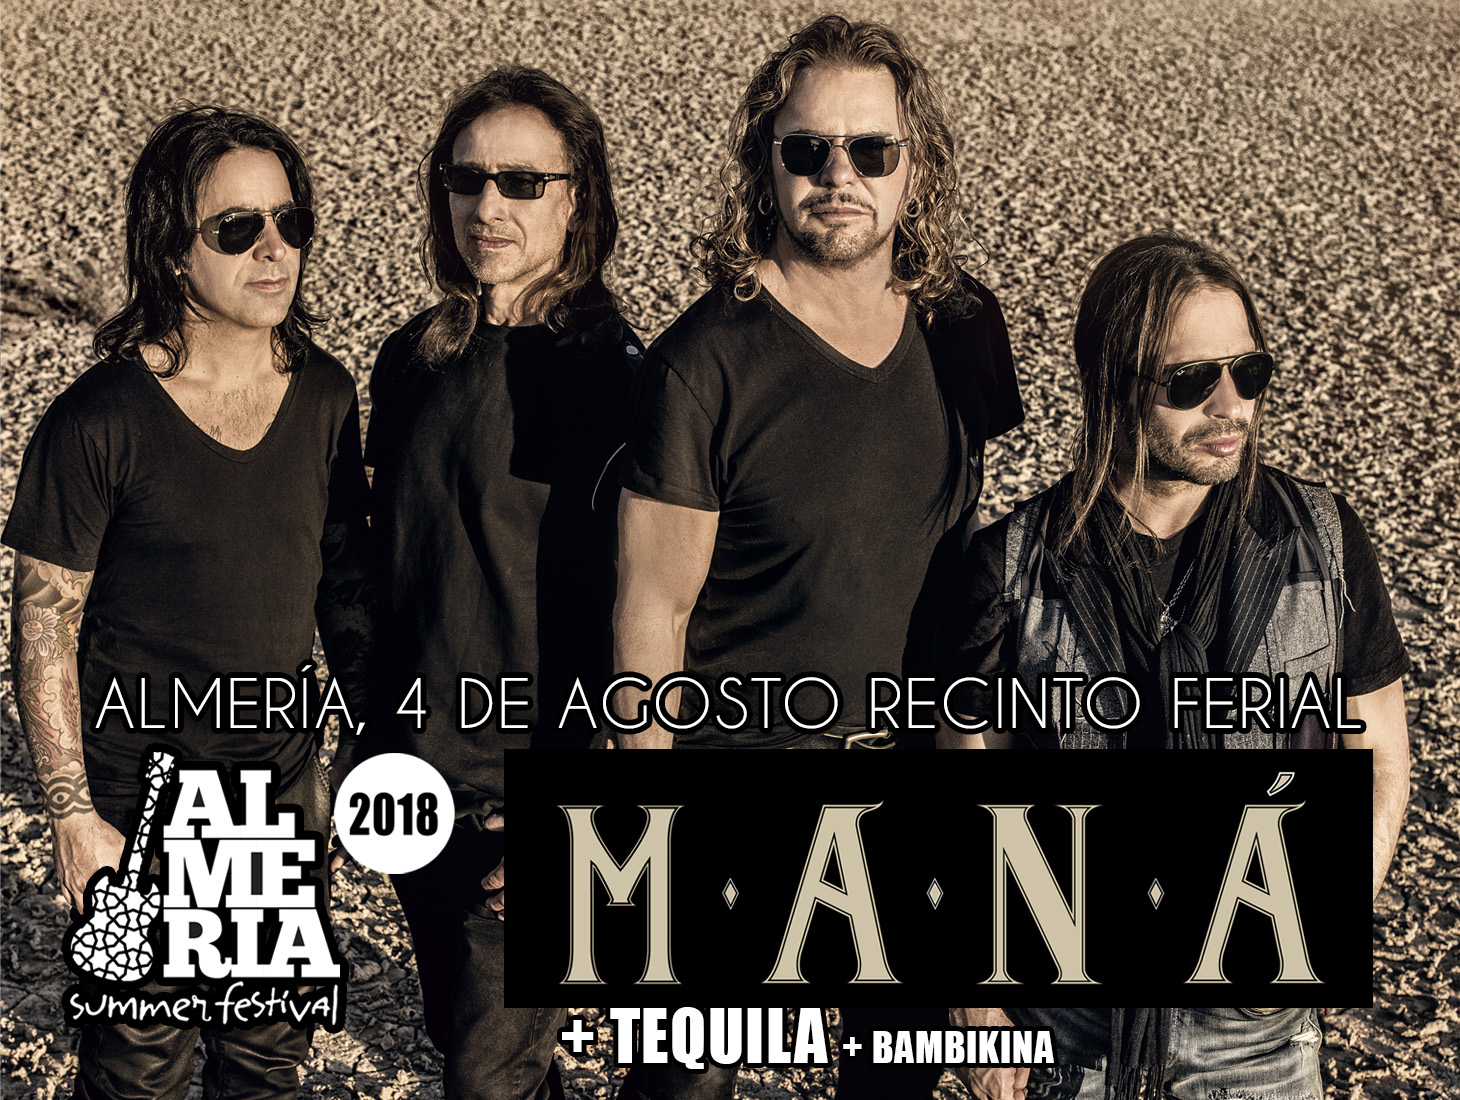 mana-tequila-bambikina-5b03ebebcc54d.jpe